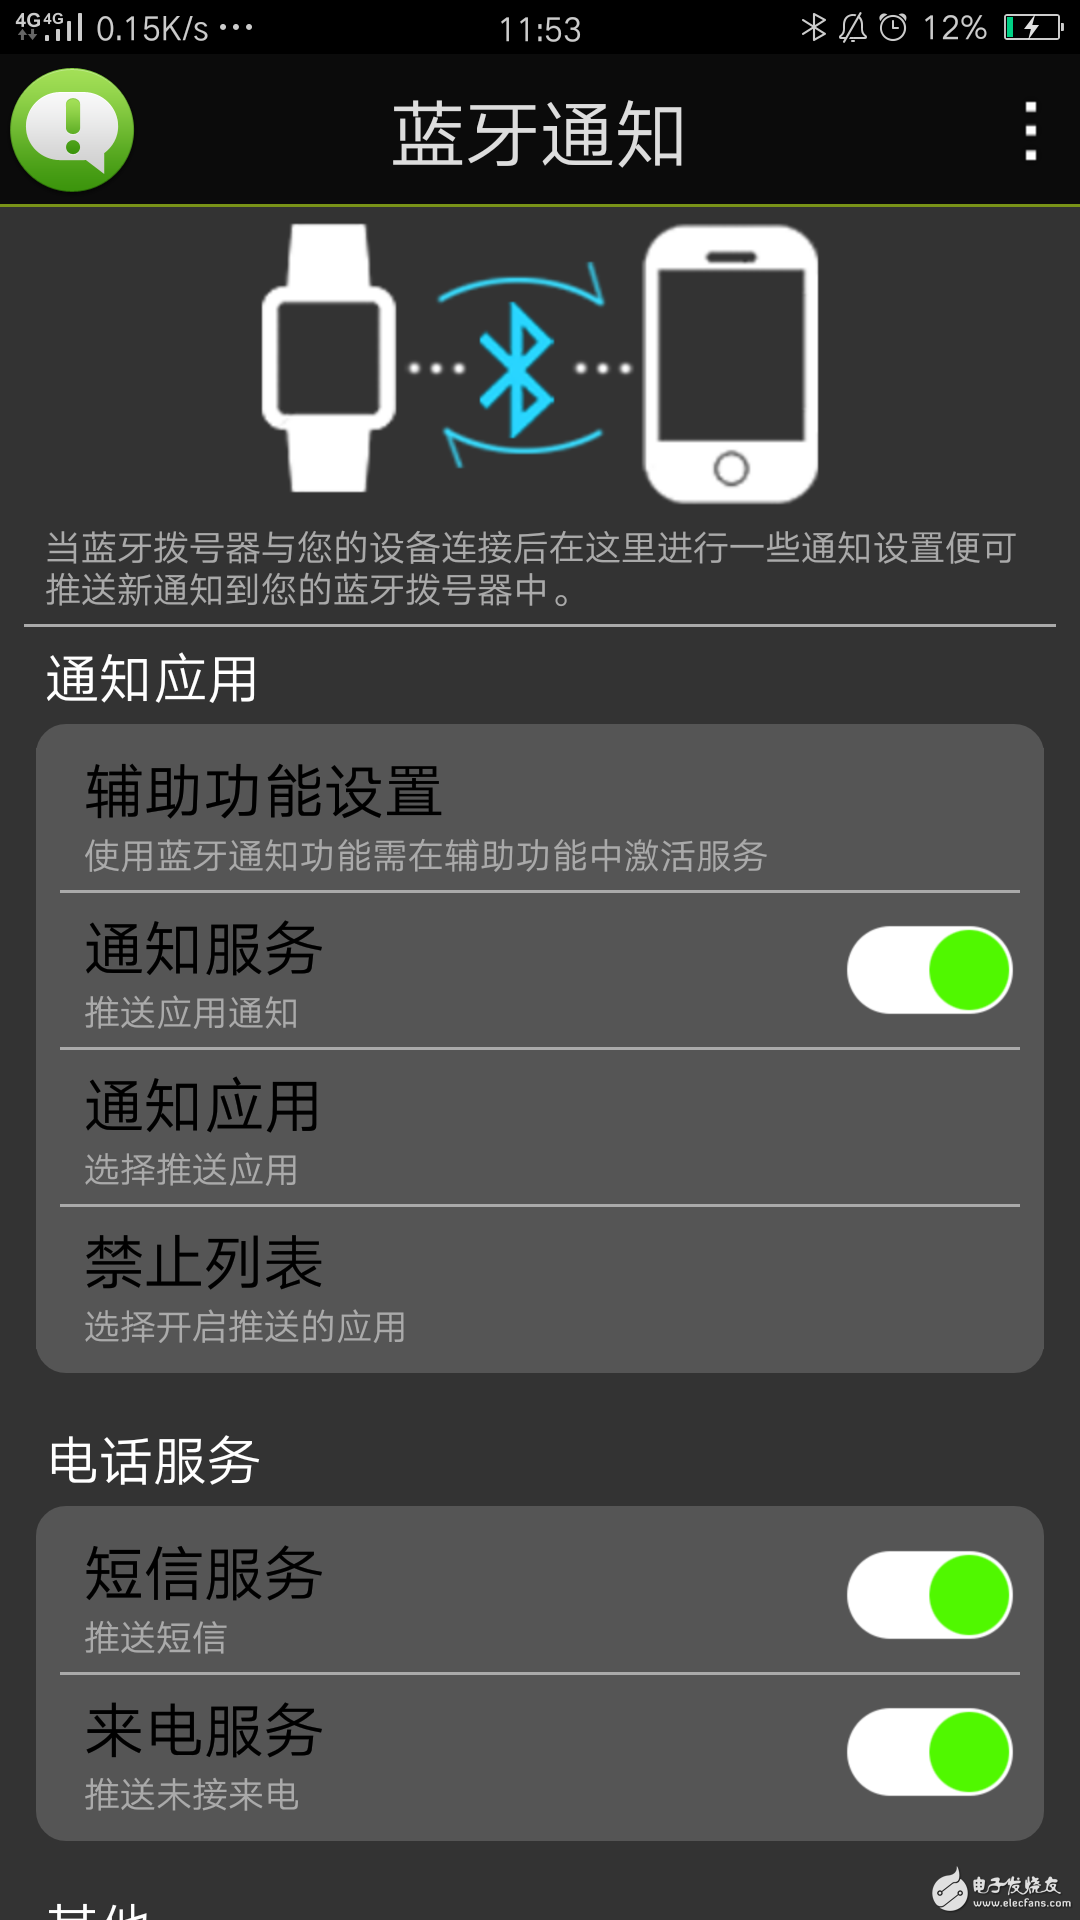 hc-05蓝牙接收手机通知并显示